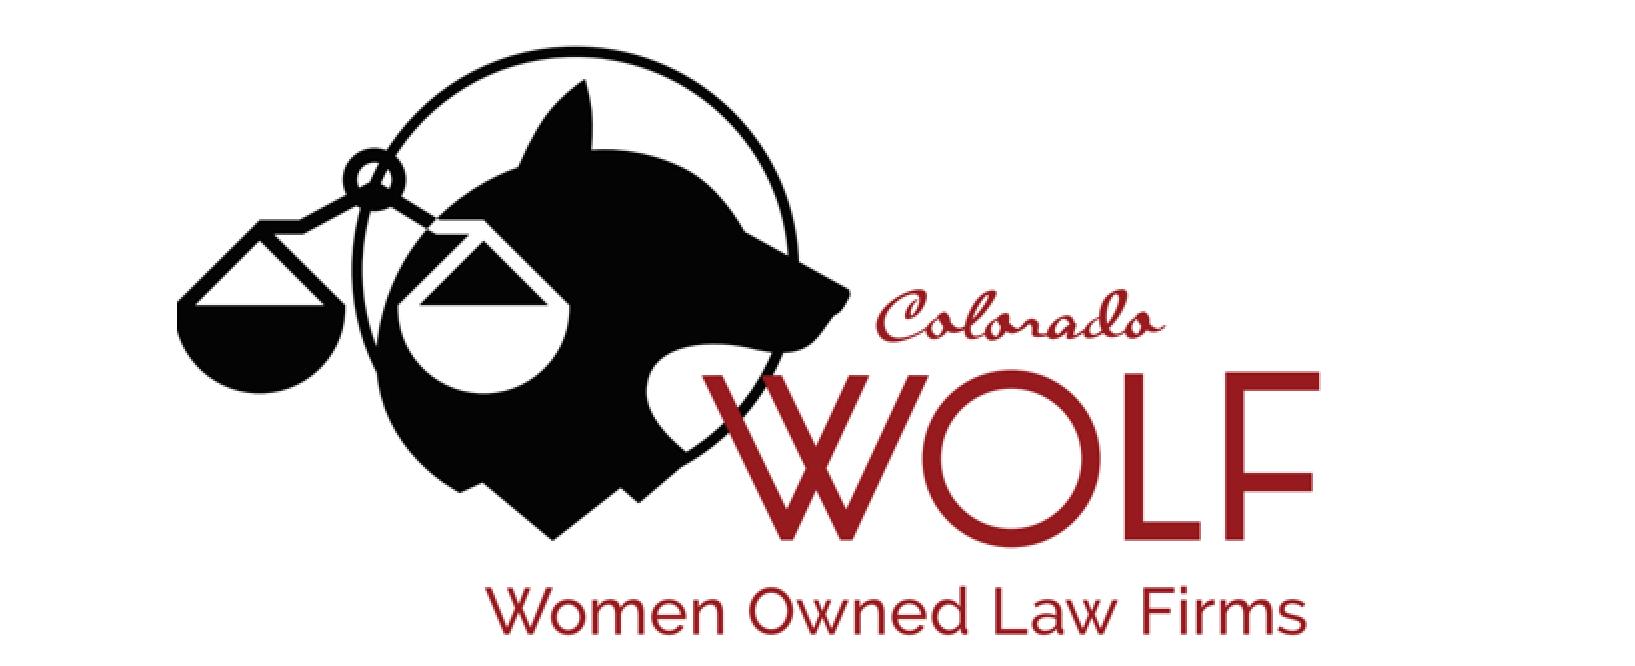 Colorado W.O.L.F.